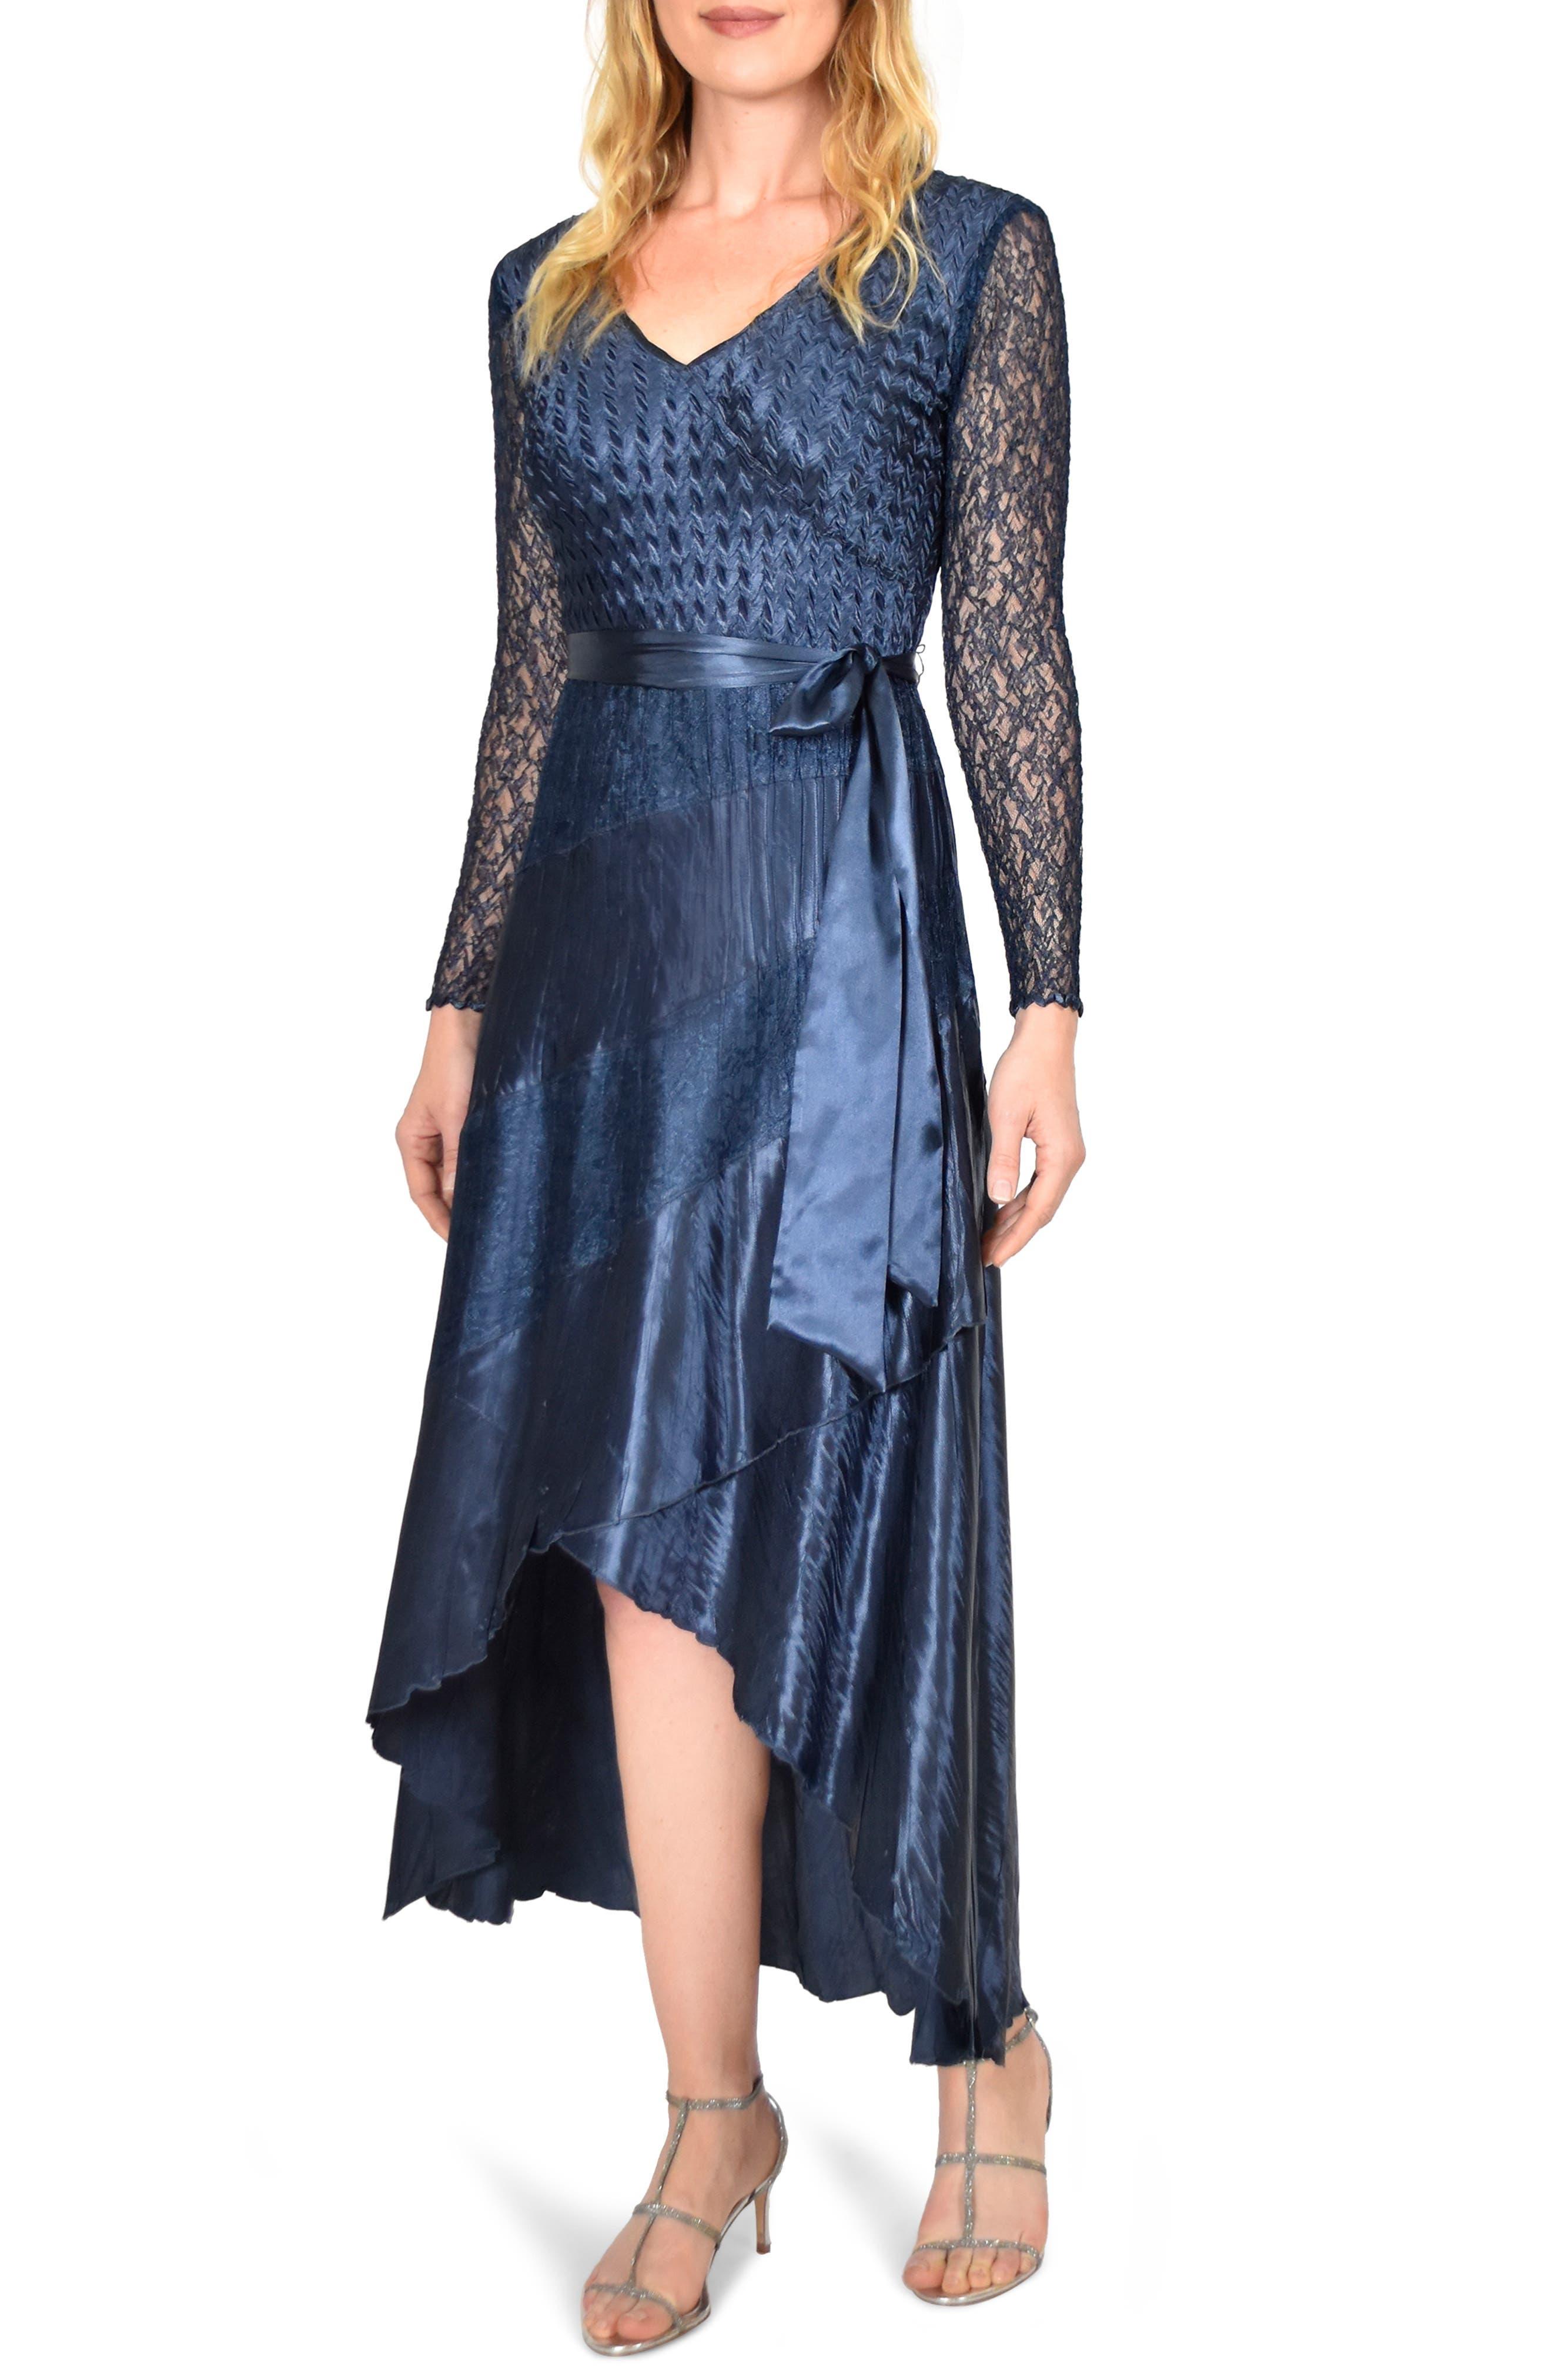 KOMAROV, Charmeuse & Chiffon High/Low Hem Dress, Main thumbnail 1, color, ECLIPSE